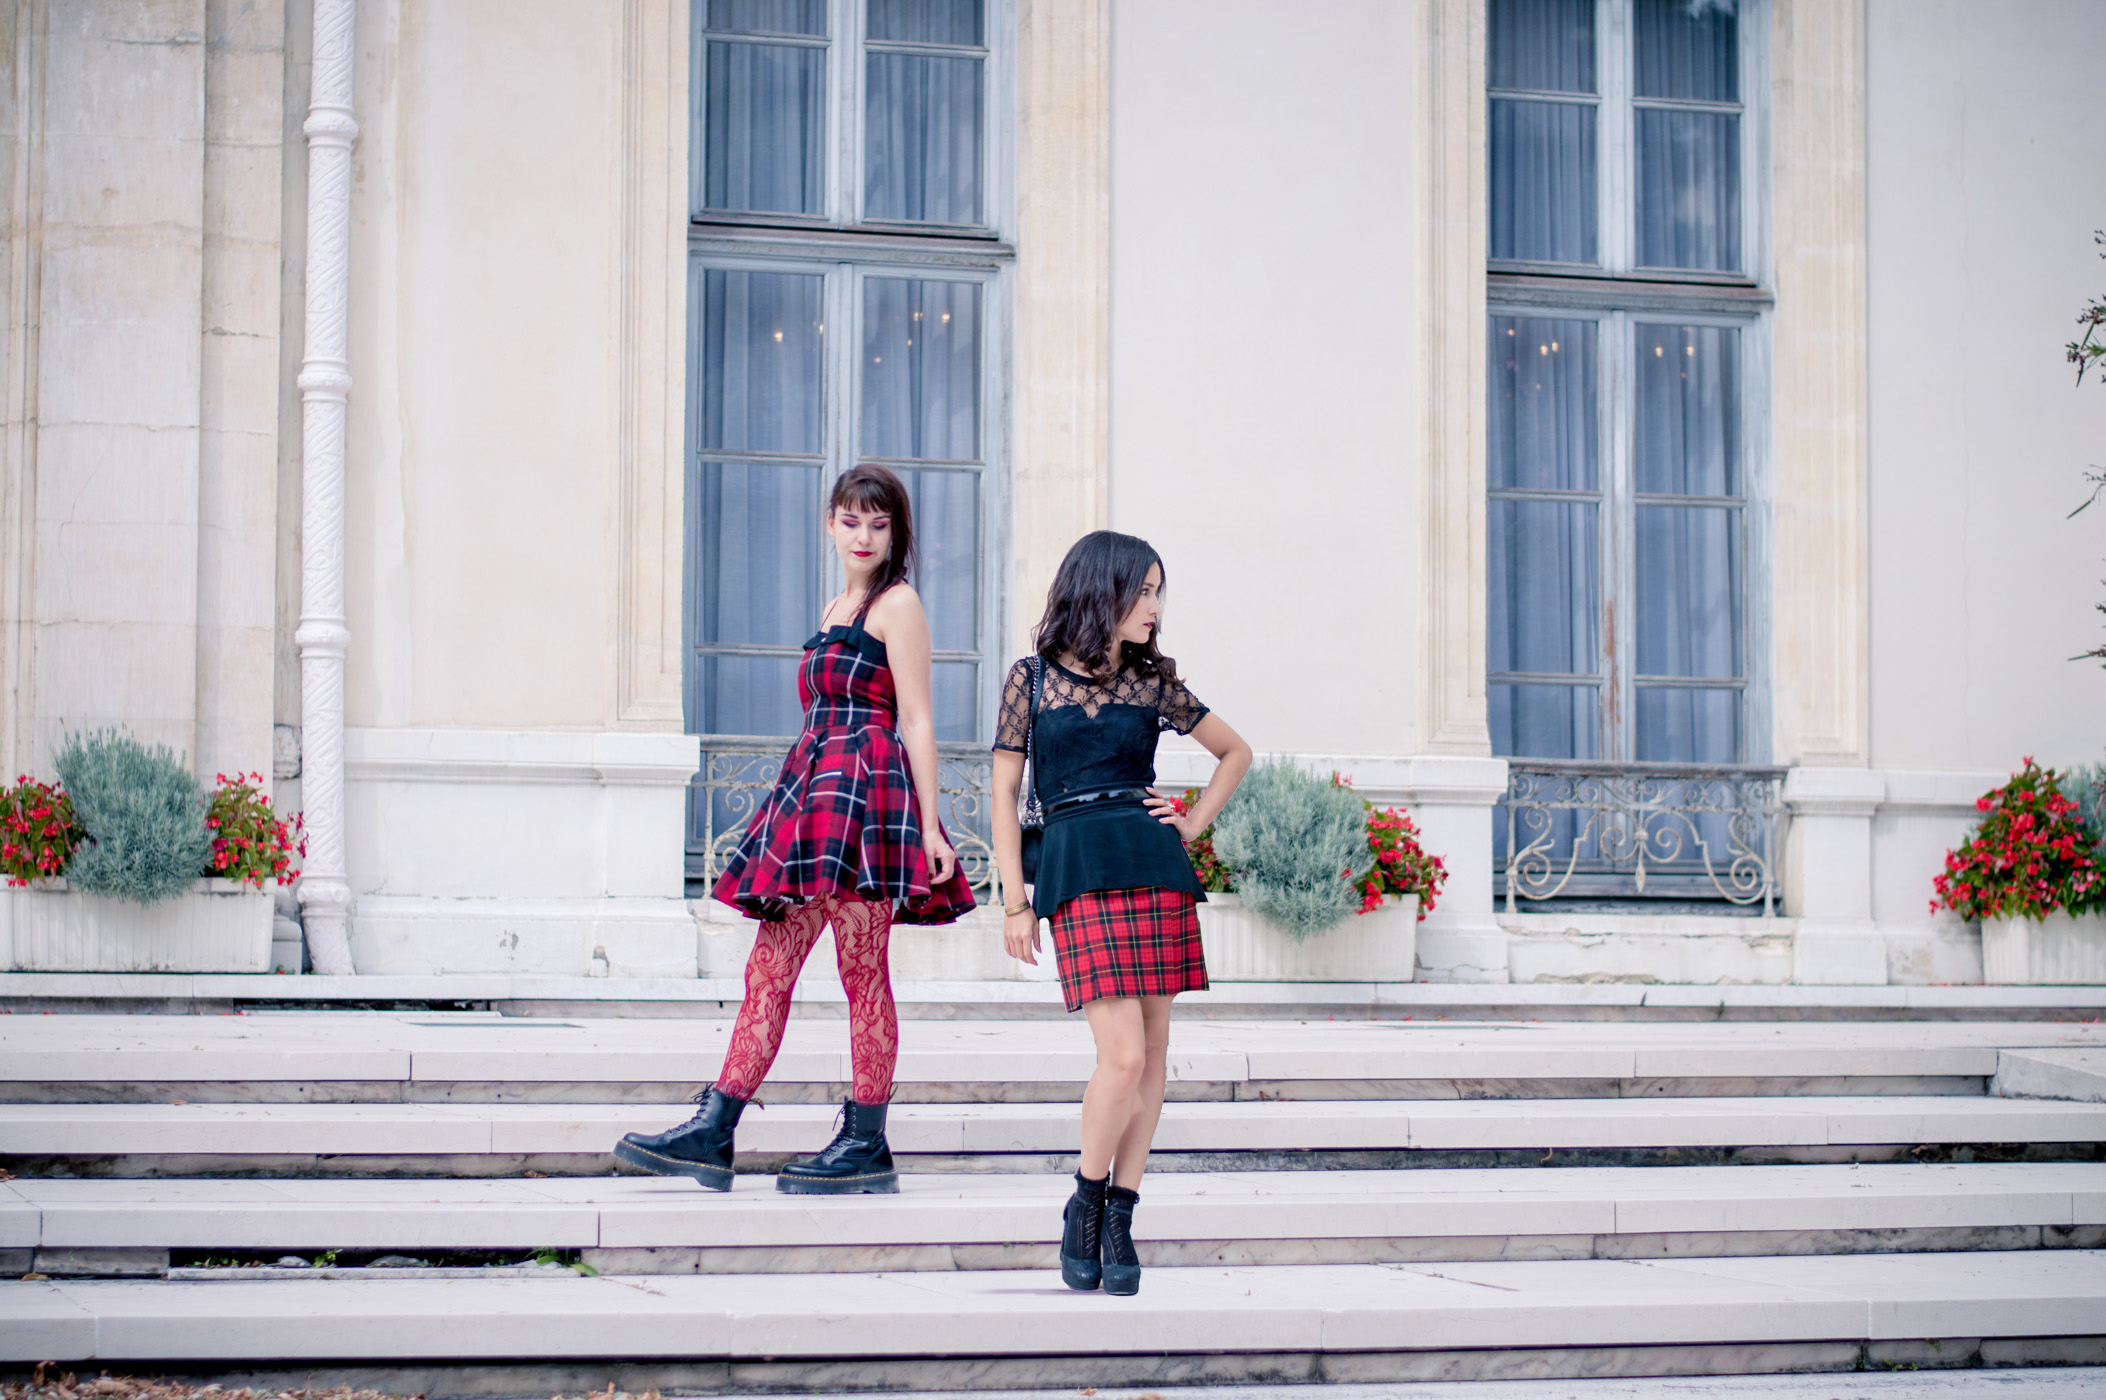 histoire du tartan punk schoolgirl oldschool plaid